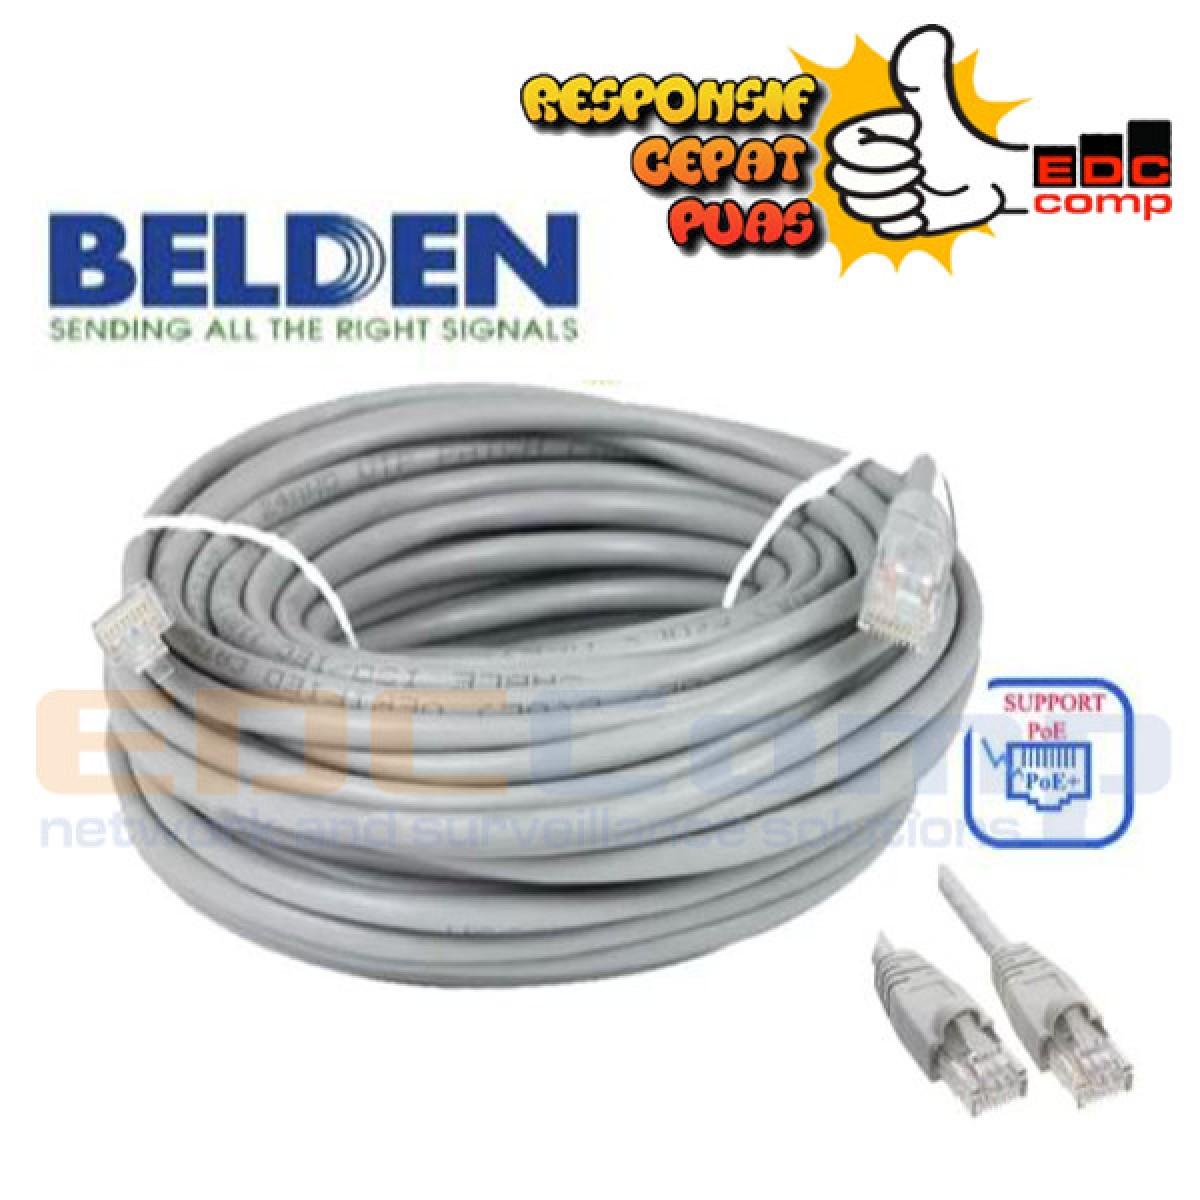 Belden UTP 60M Kabel LAN Cat5e 60 Meter Cable Original USA - EdcComp